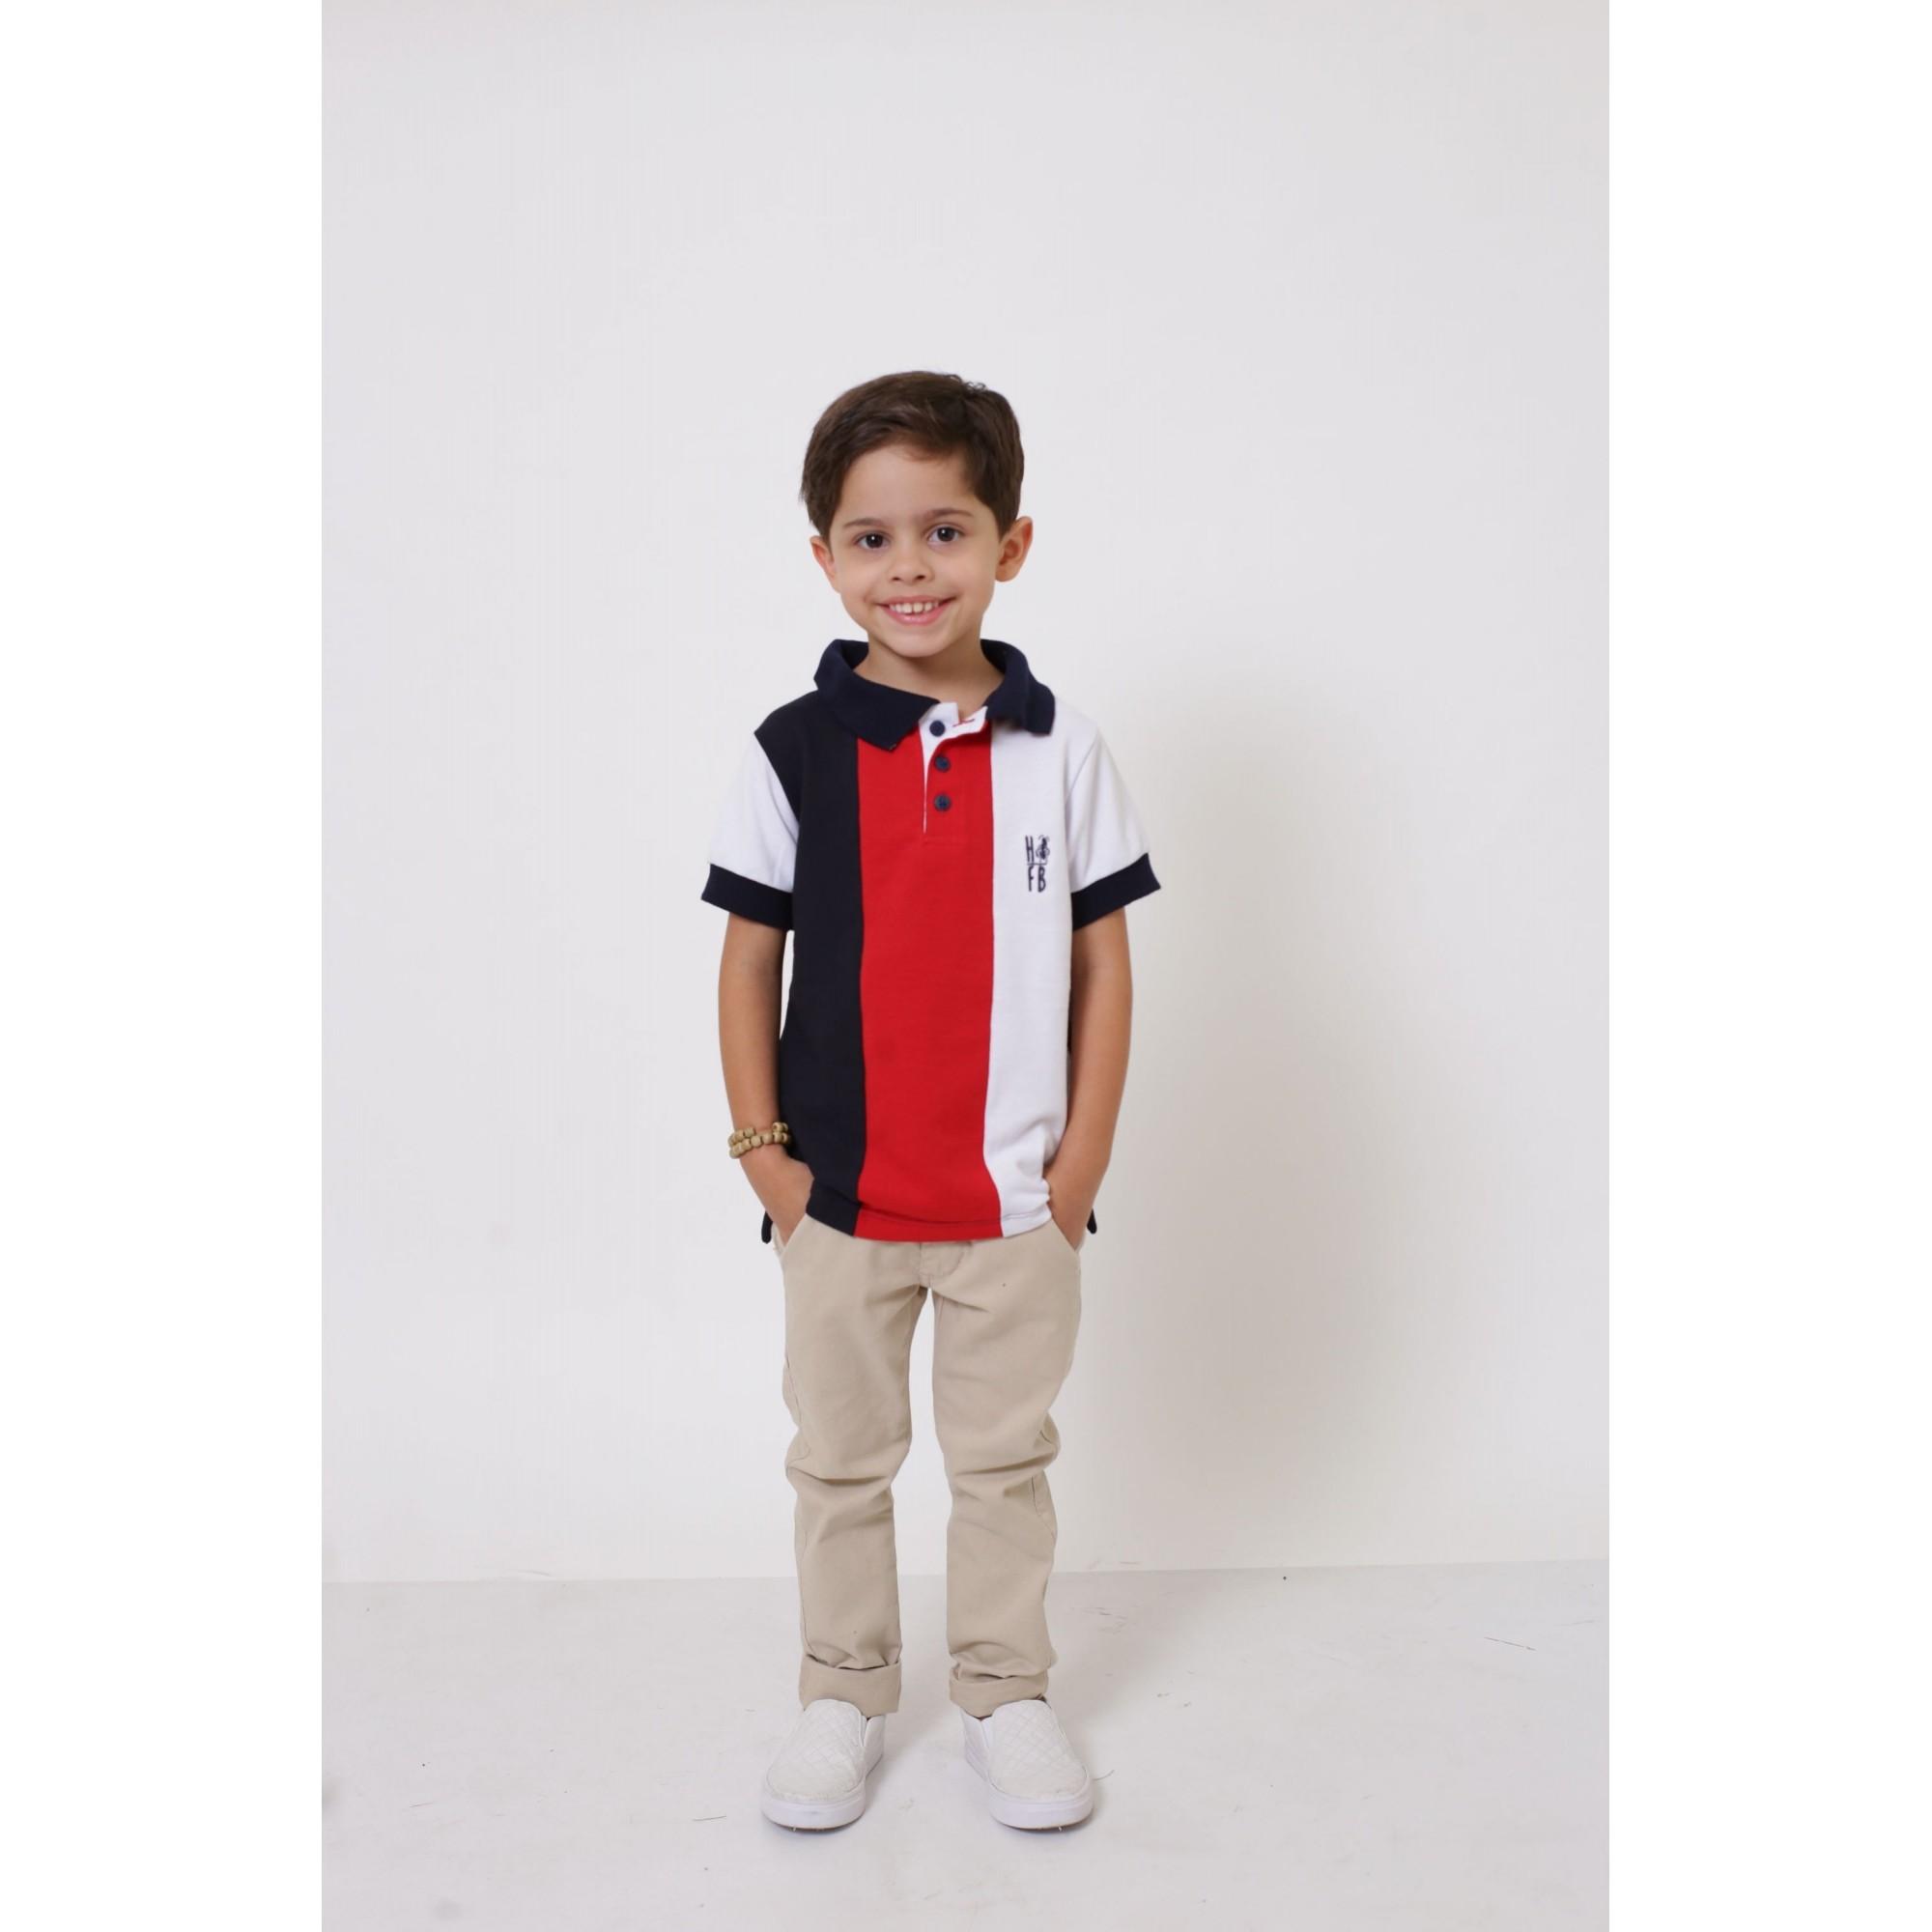 MÃE E FILHO > Kit 02 peças - Camisas ou Body Polo - Listrados King [Coleção Tal Mãe Tal Filho]  - Heitor Fashion Brazil